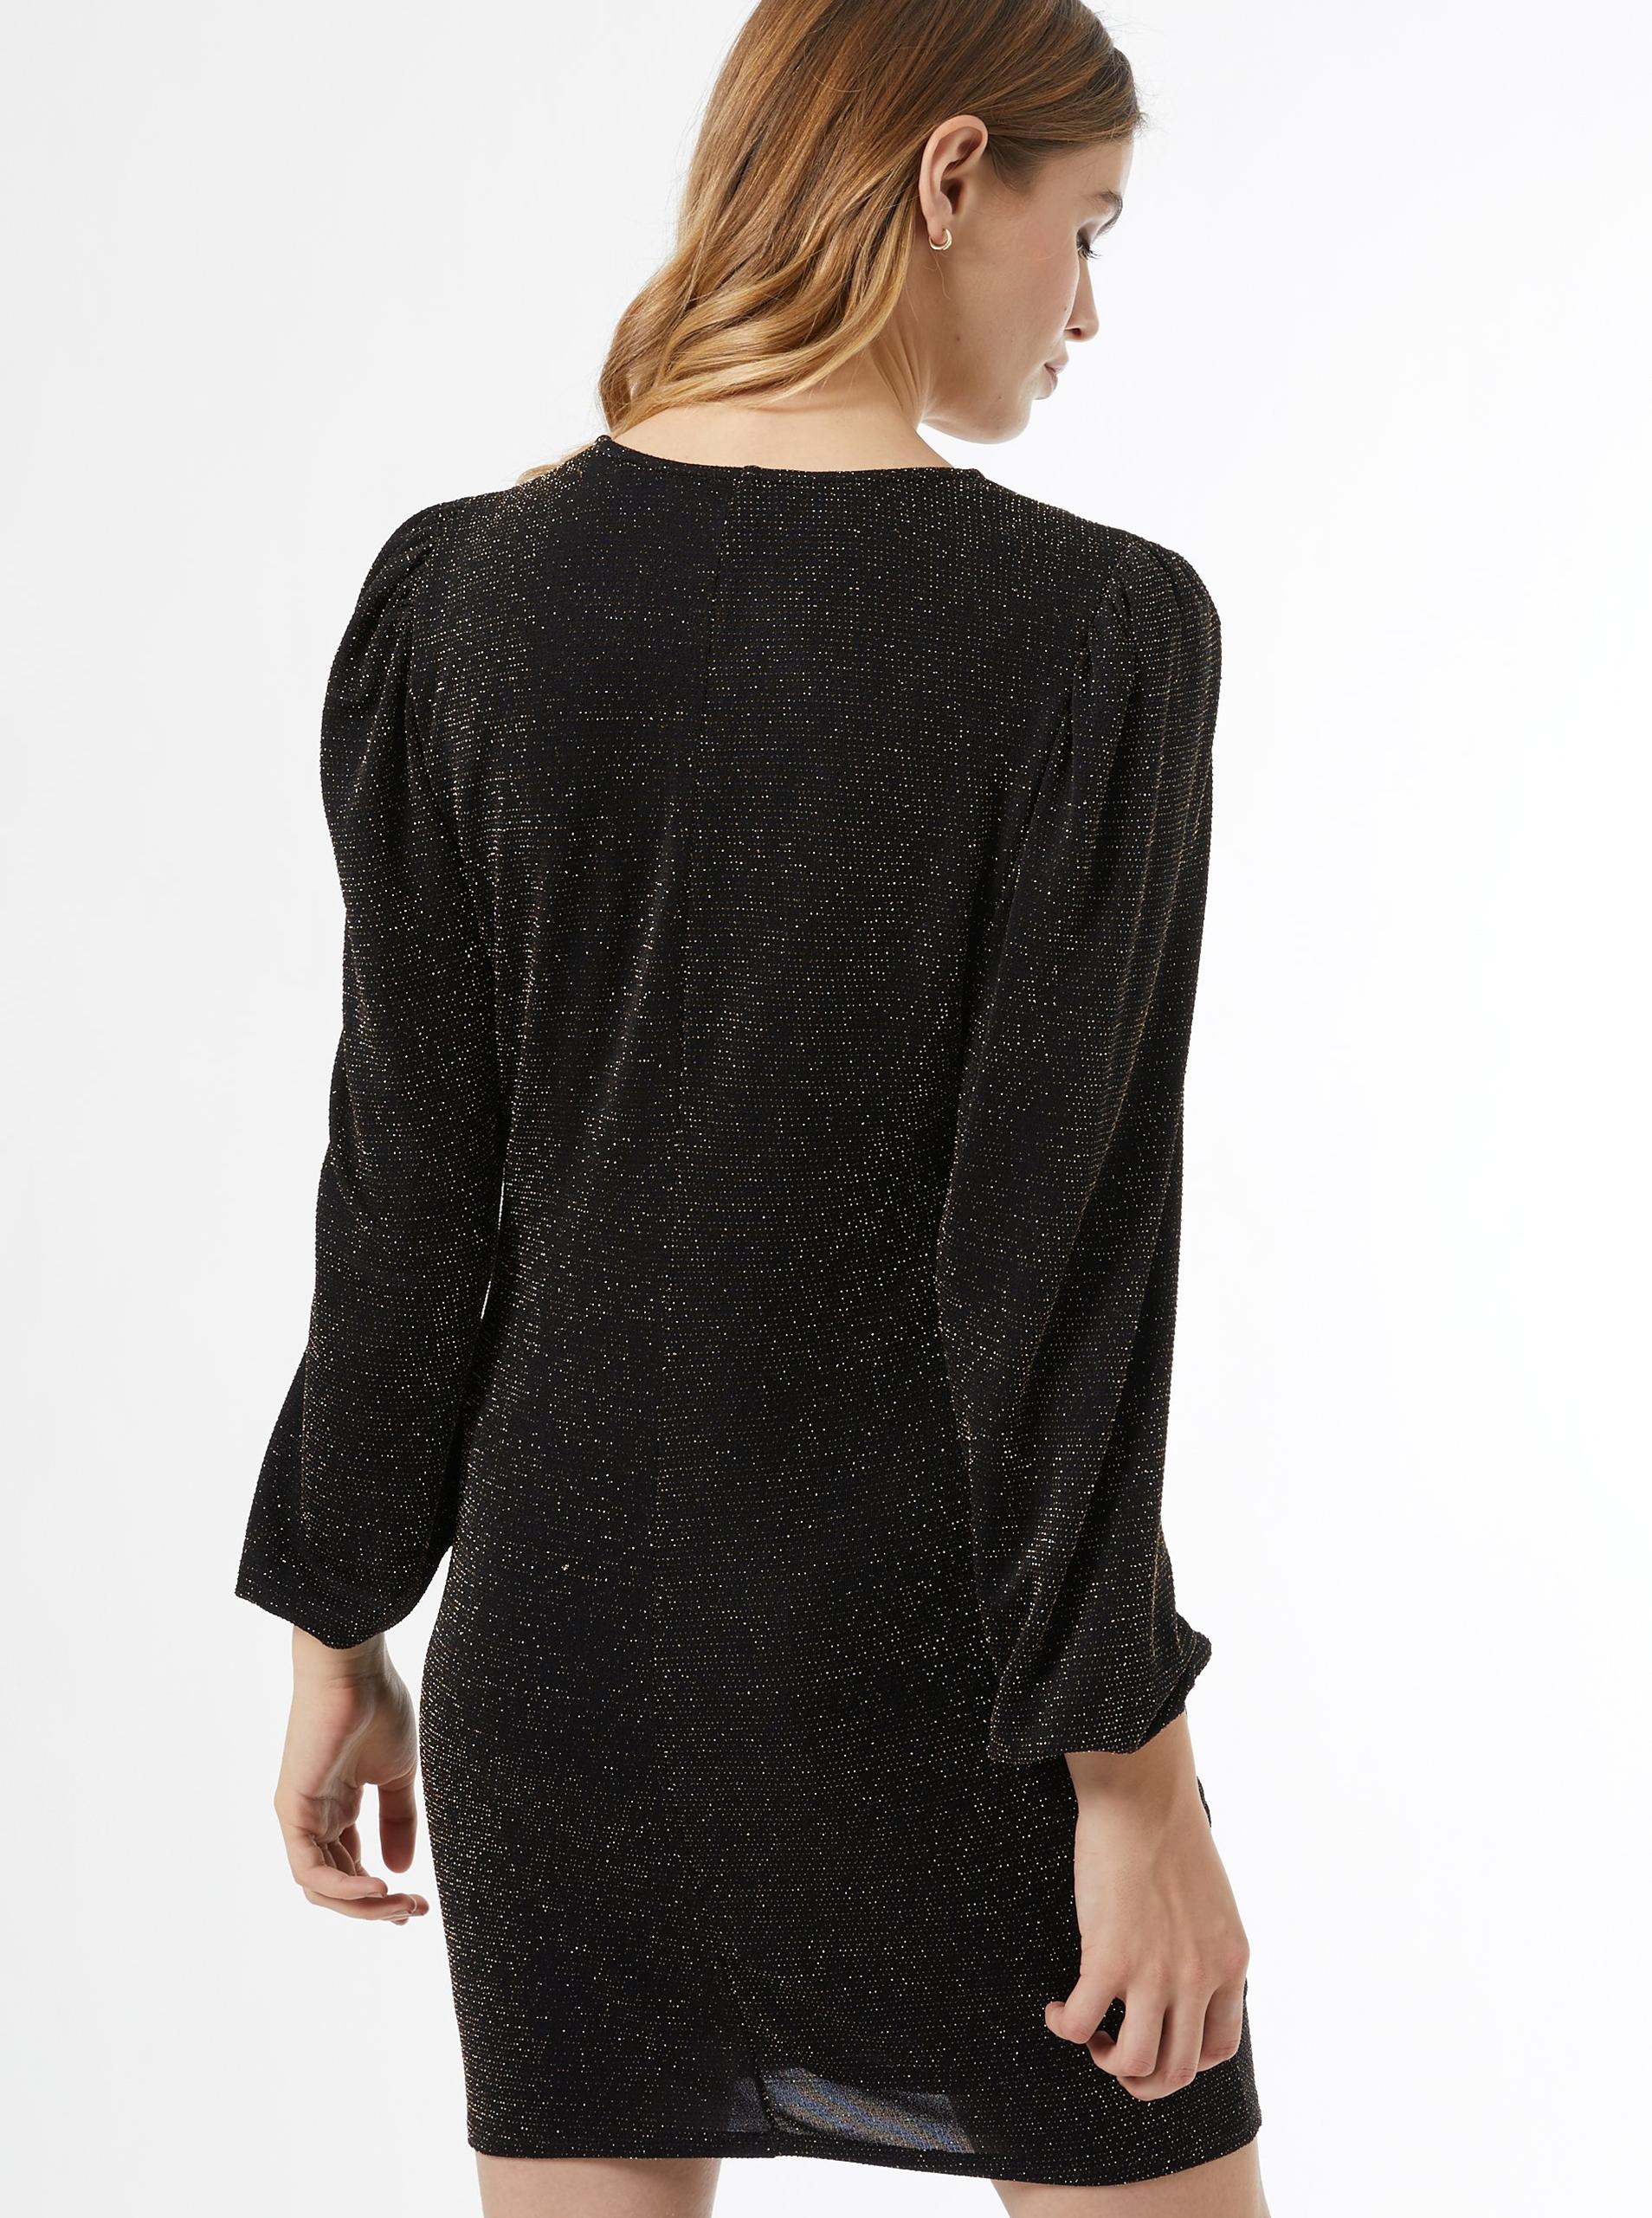 Dorothy Perkins black glittering dress